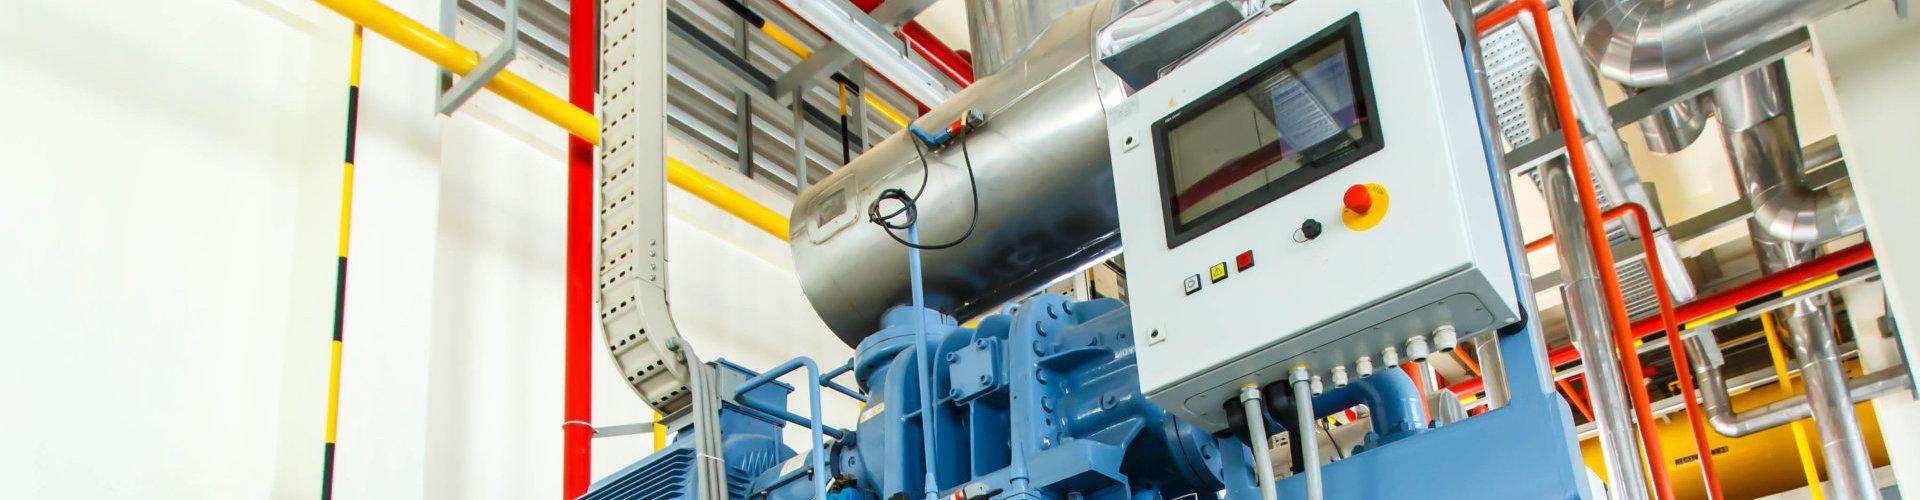 compressor refrigeration at manufacture building